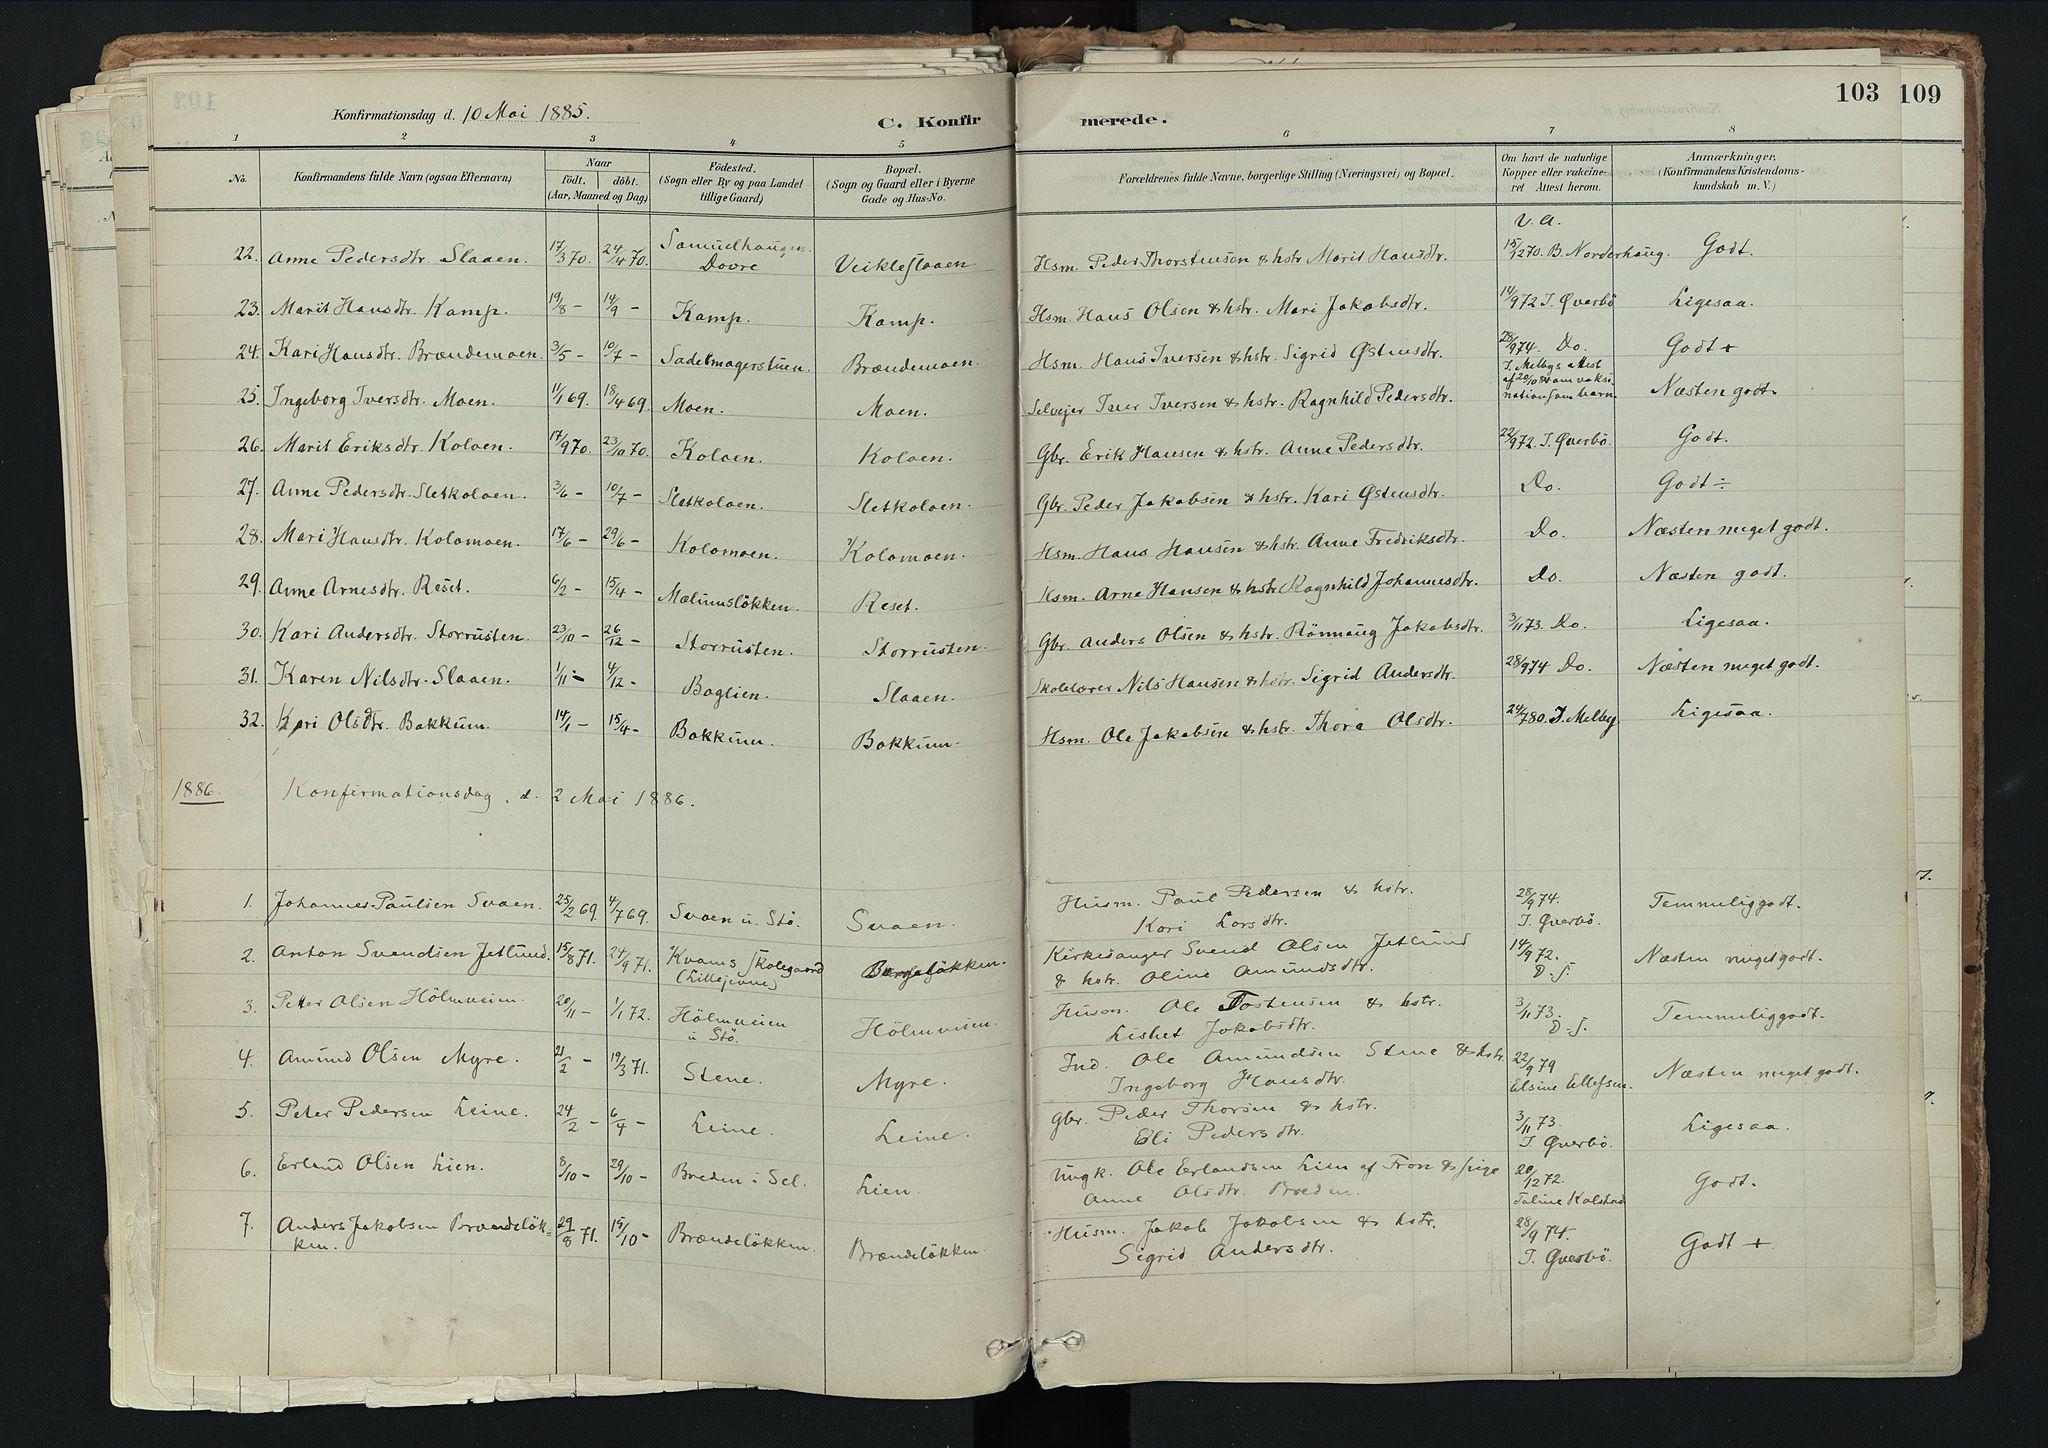 SAH, Nord-Fron prestekontor, Ministerialbok nr. 3, 1884-1914, s. 103